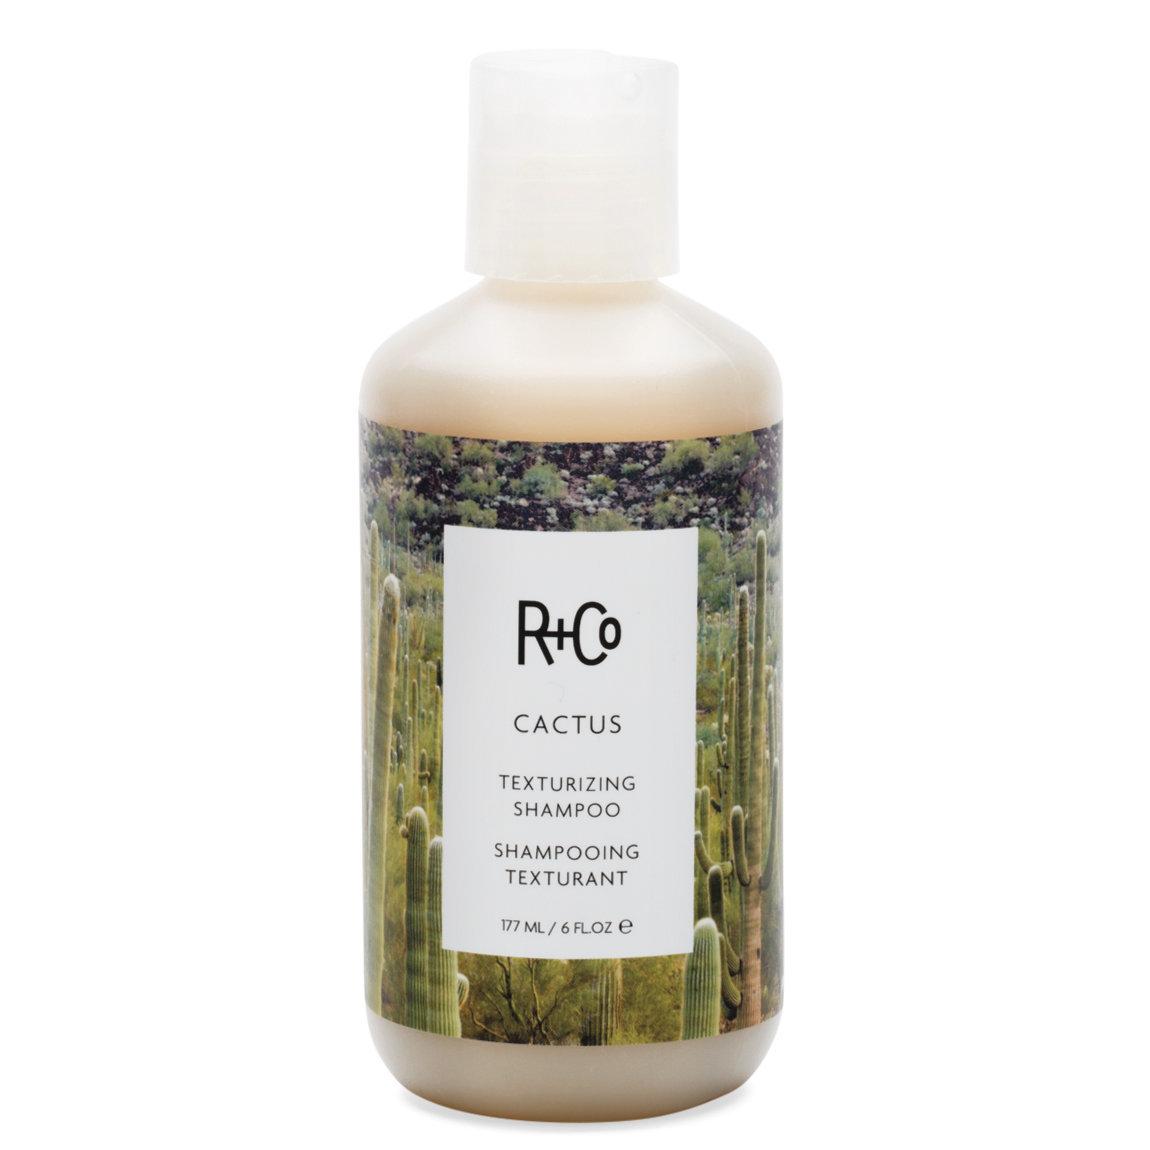 R+Co - Cactus Texturizing Shampoo